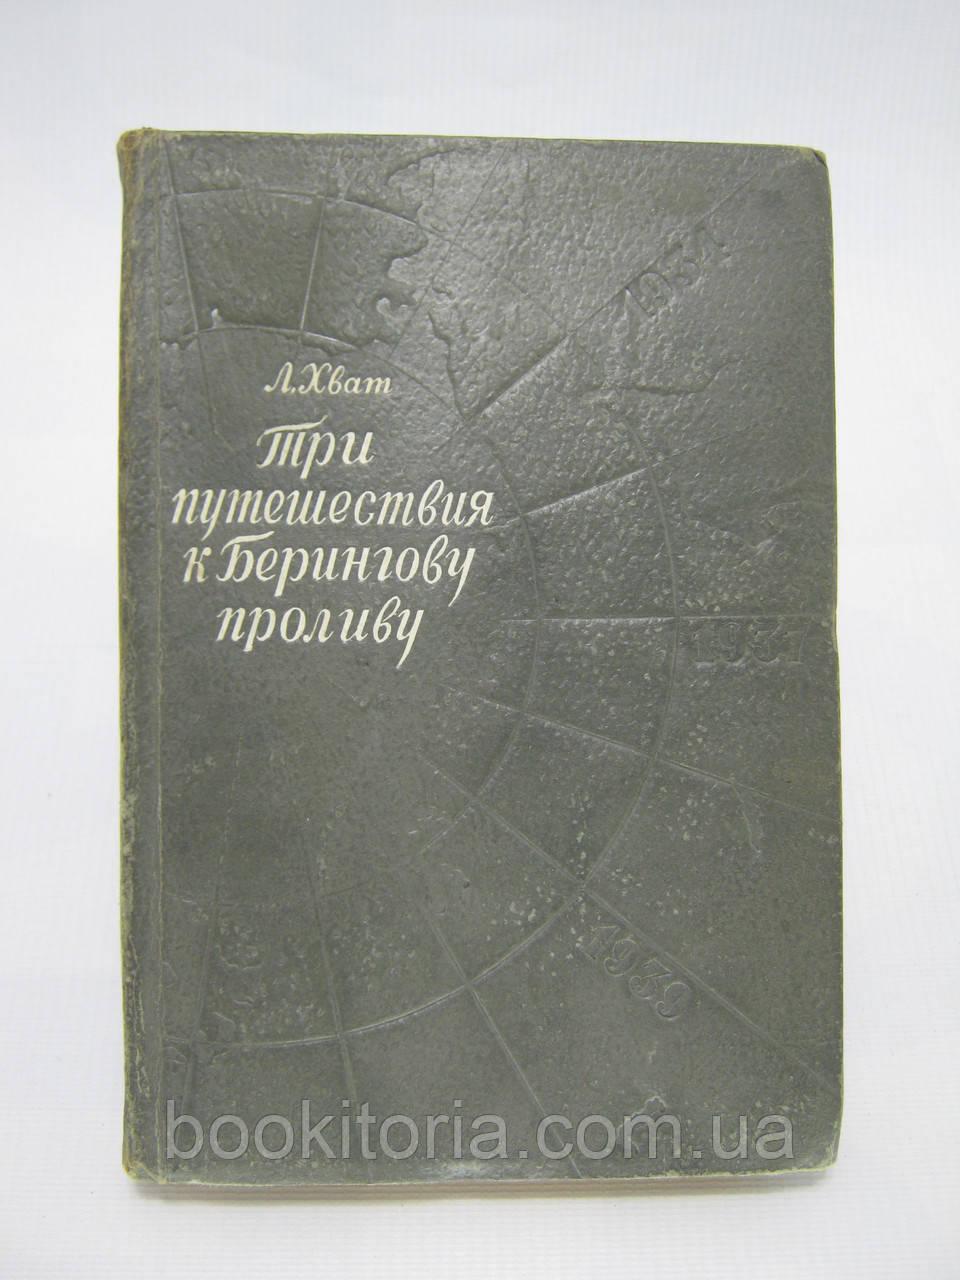 Хват Л. Три путешествия к Берингову проливу. Записки журналиста (б/у).